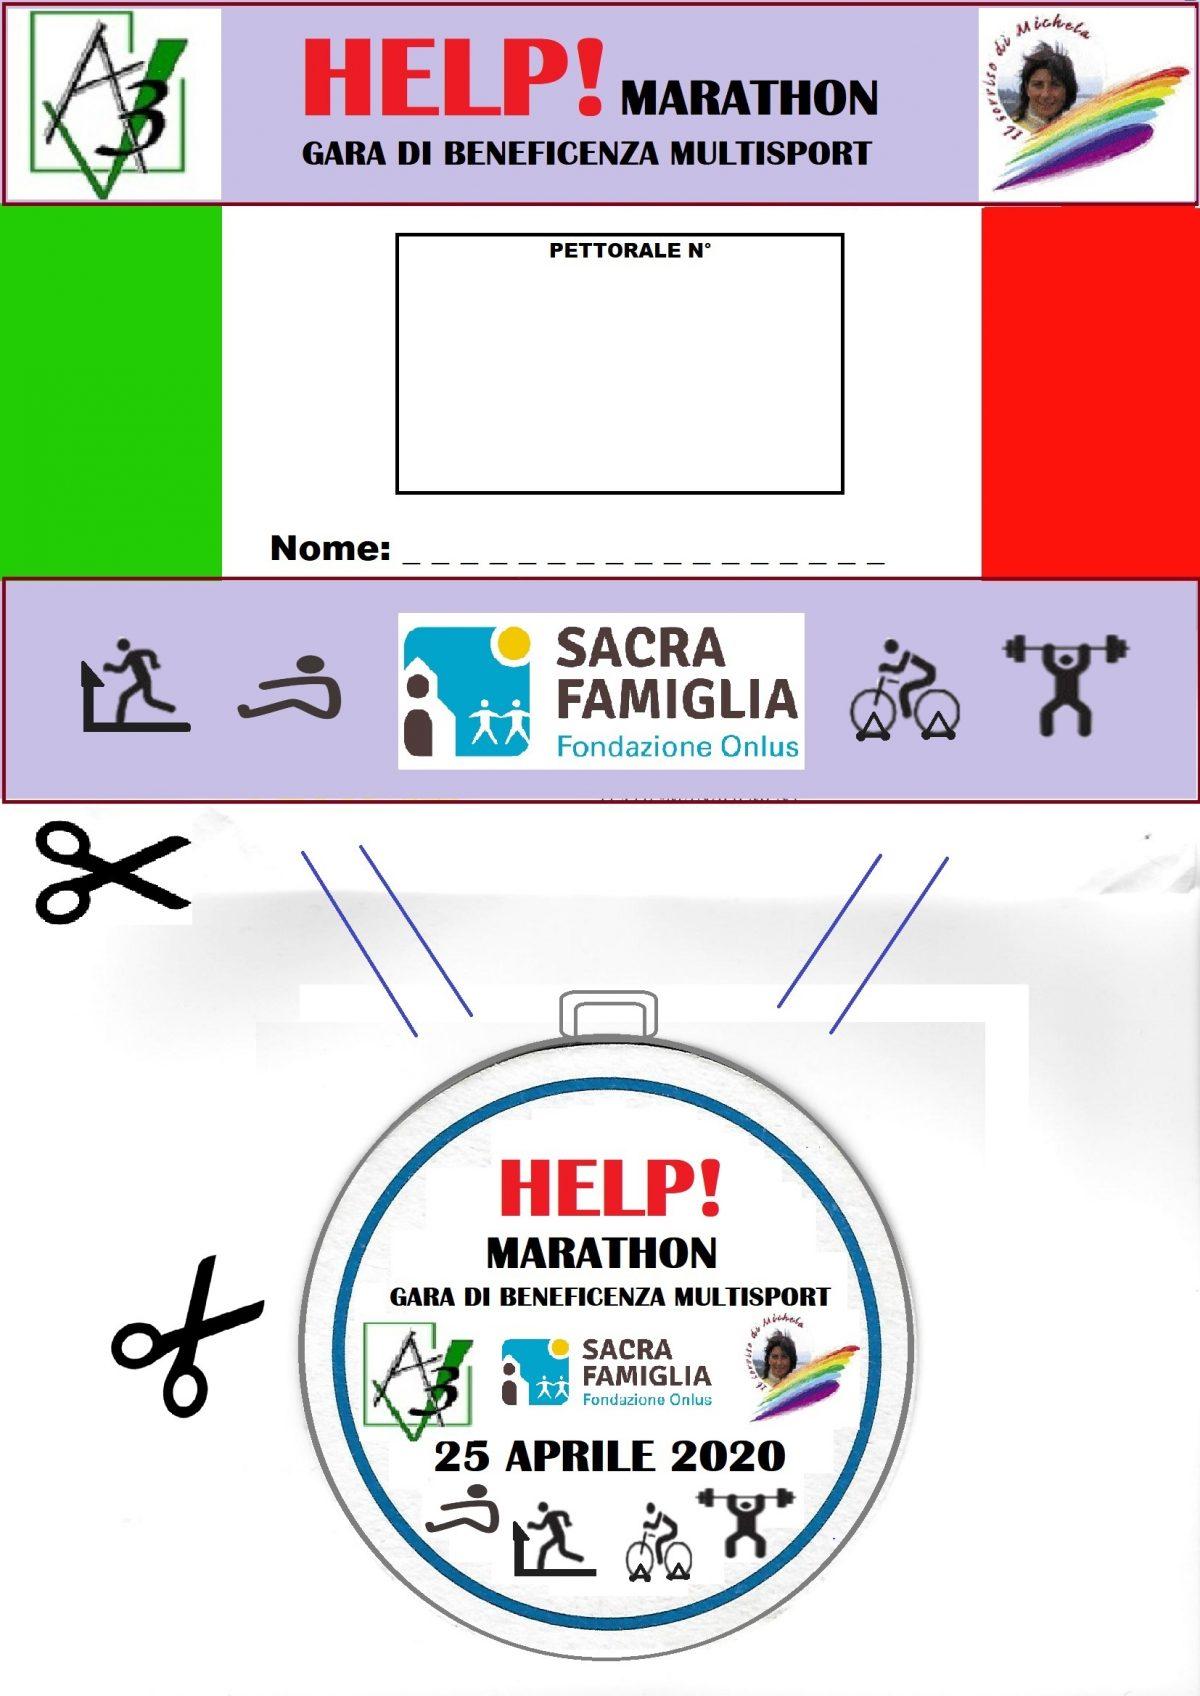 Help! Marathon … una mano alla 'Sacra Famiglia'